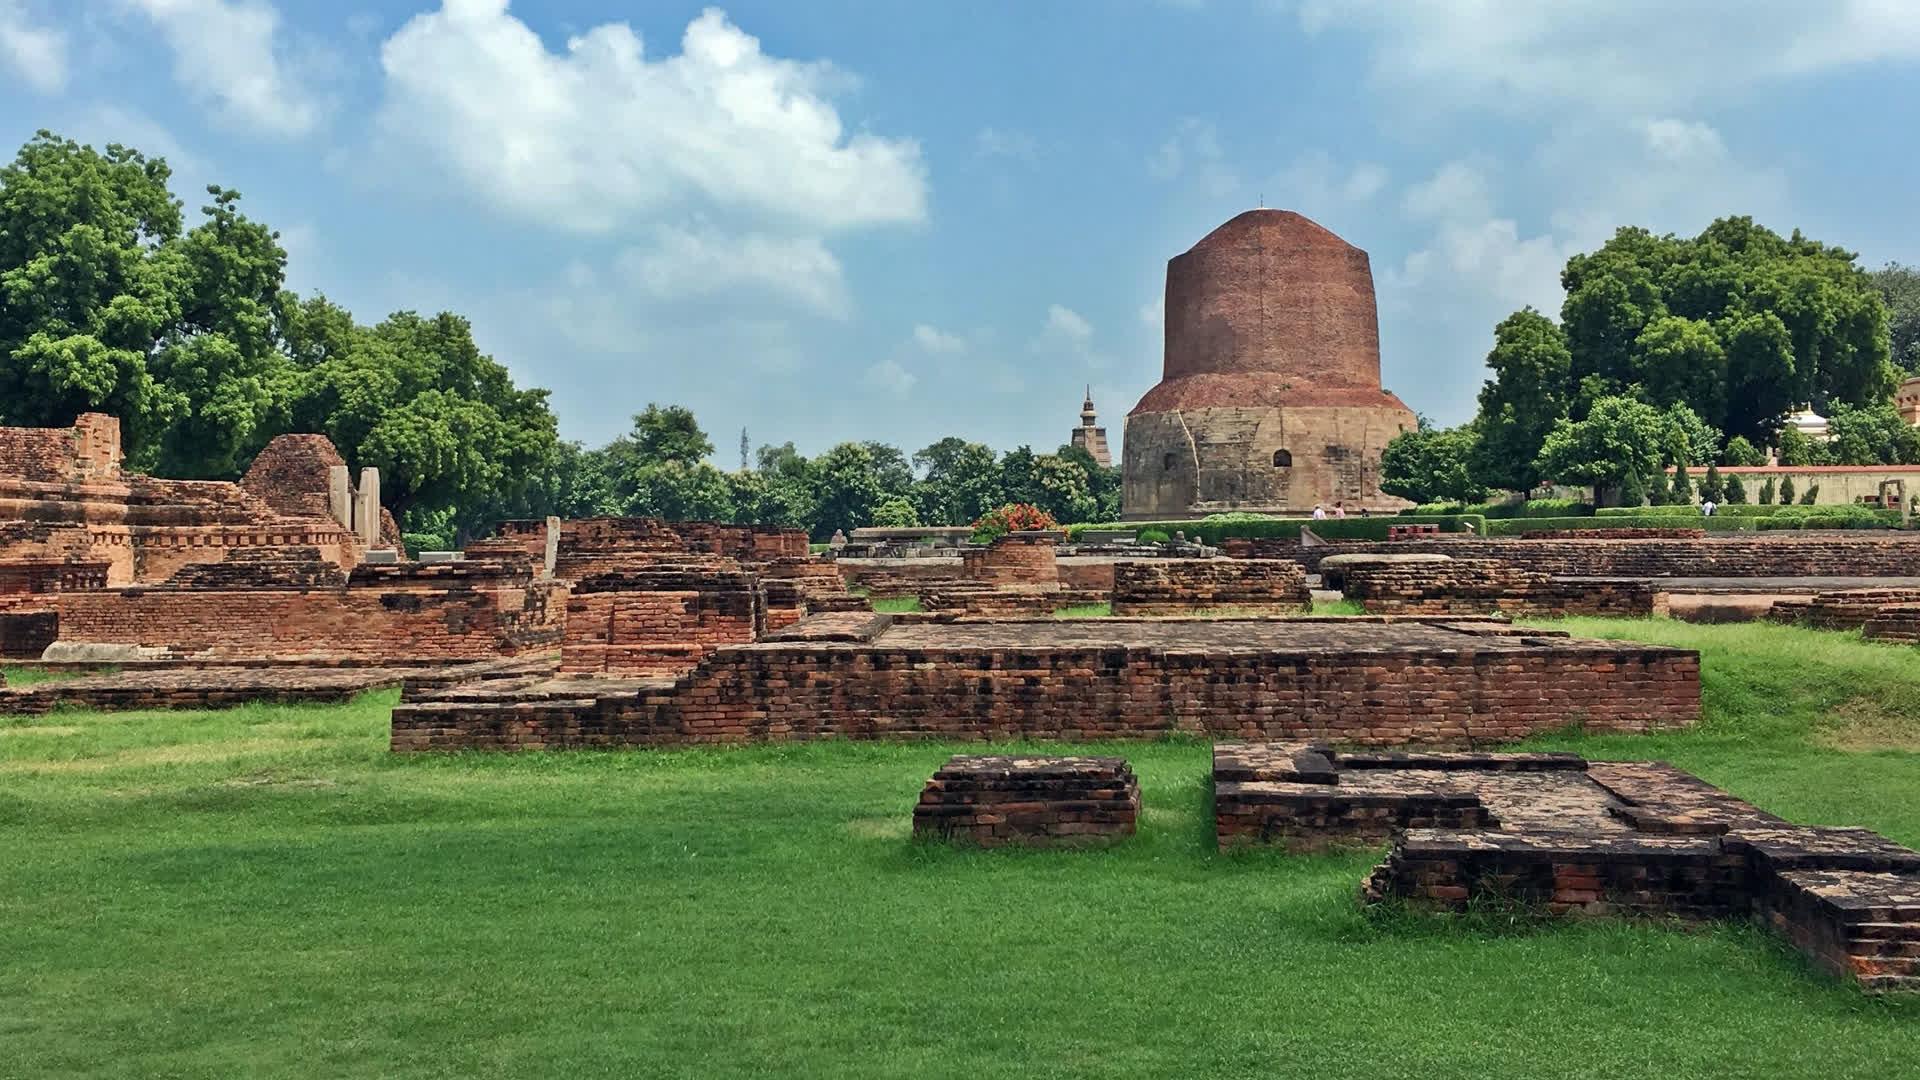 Sarnath: Where Buddha Spoke